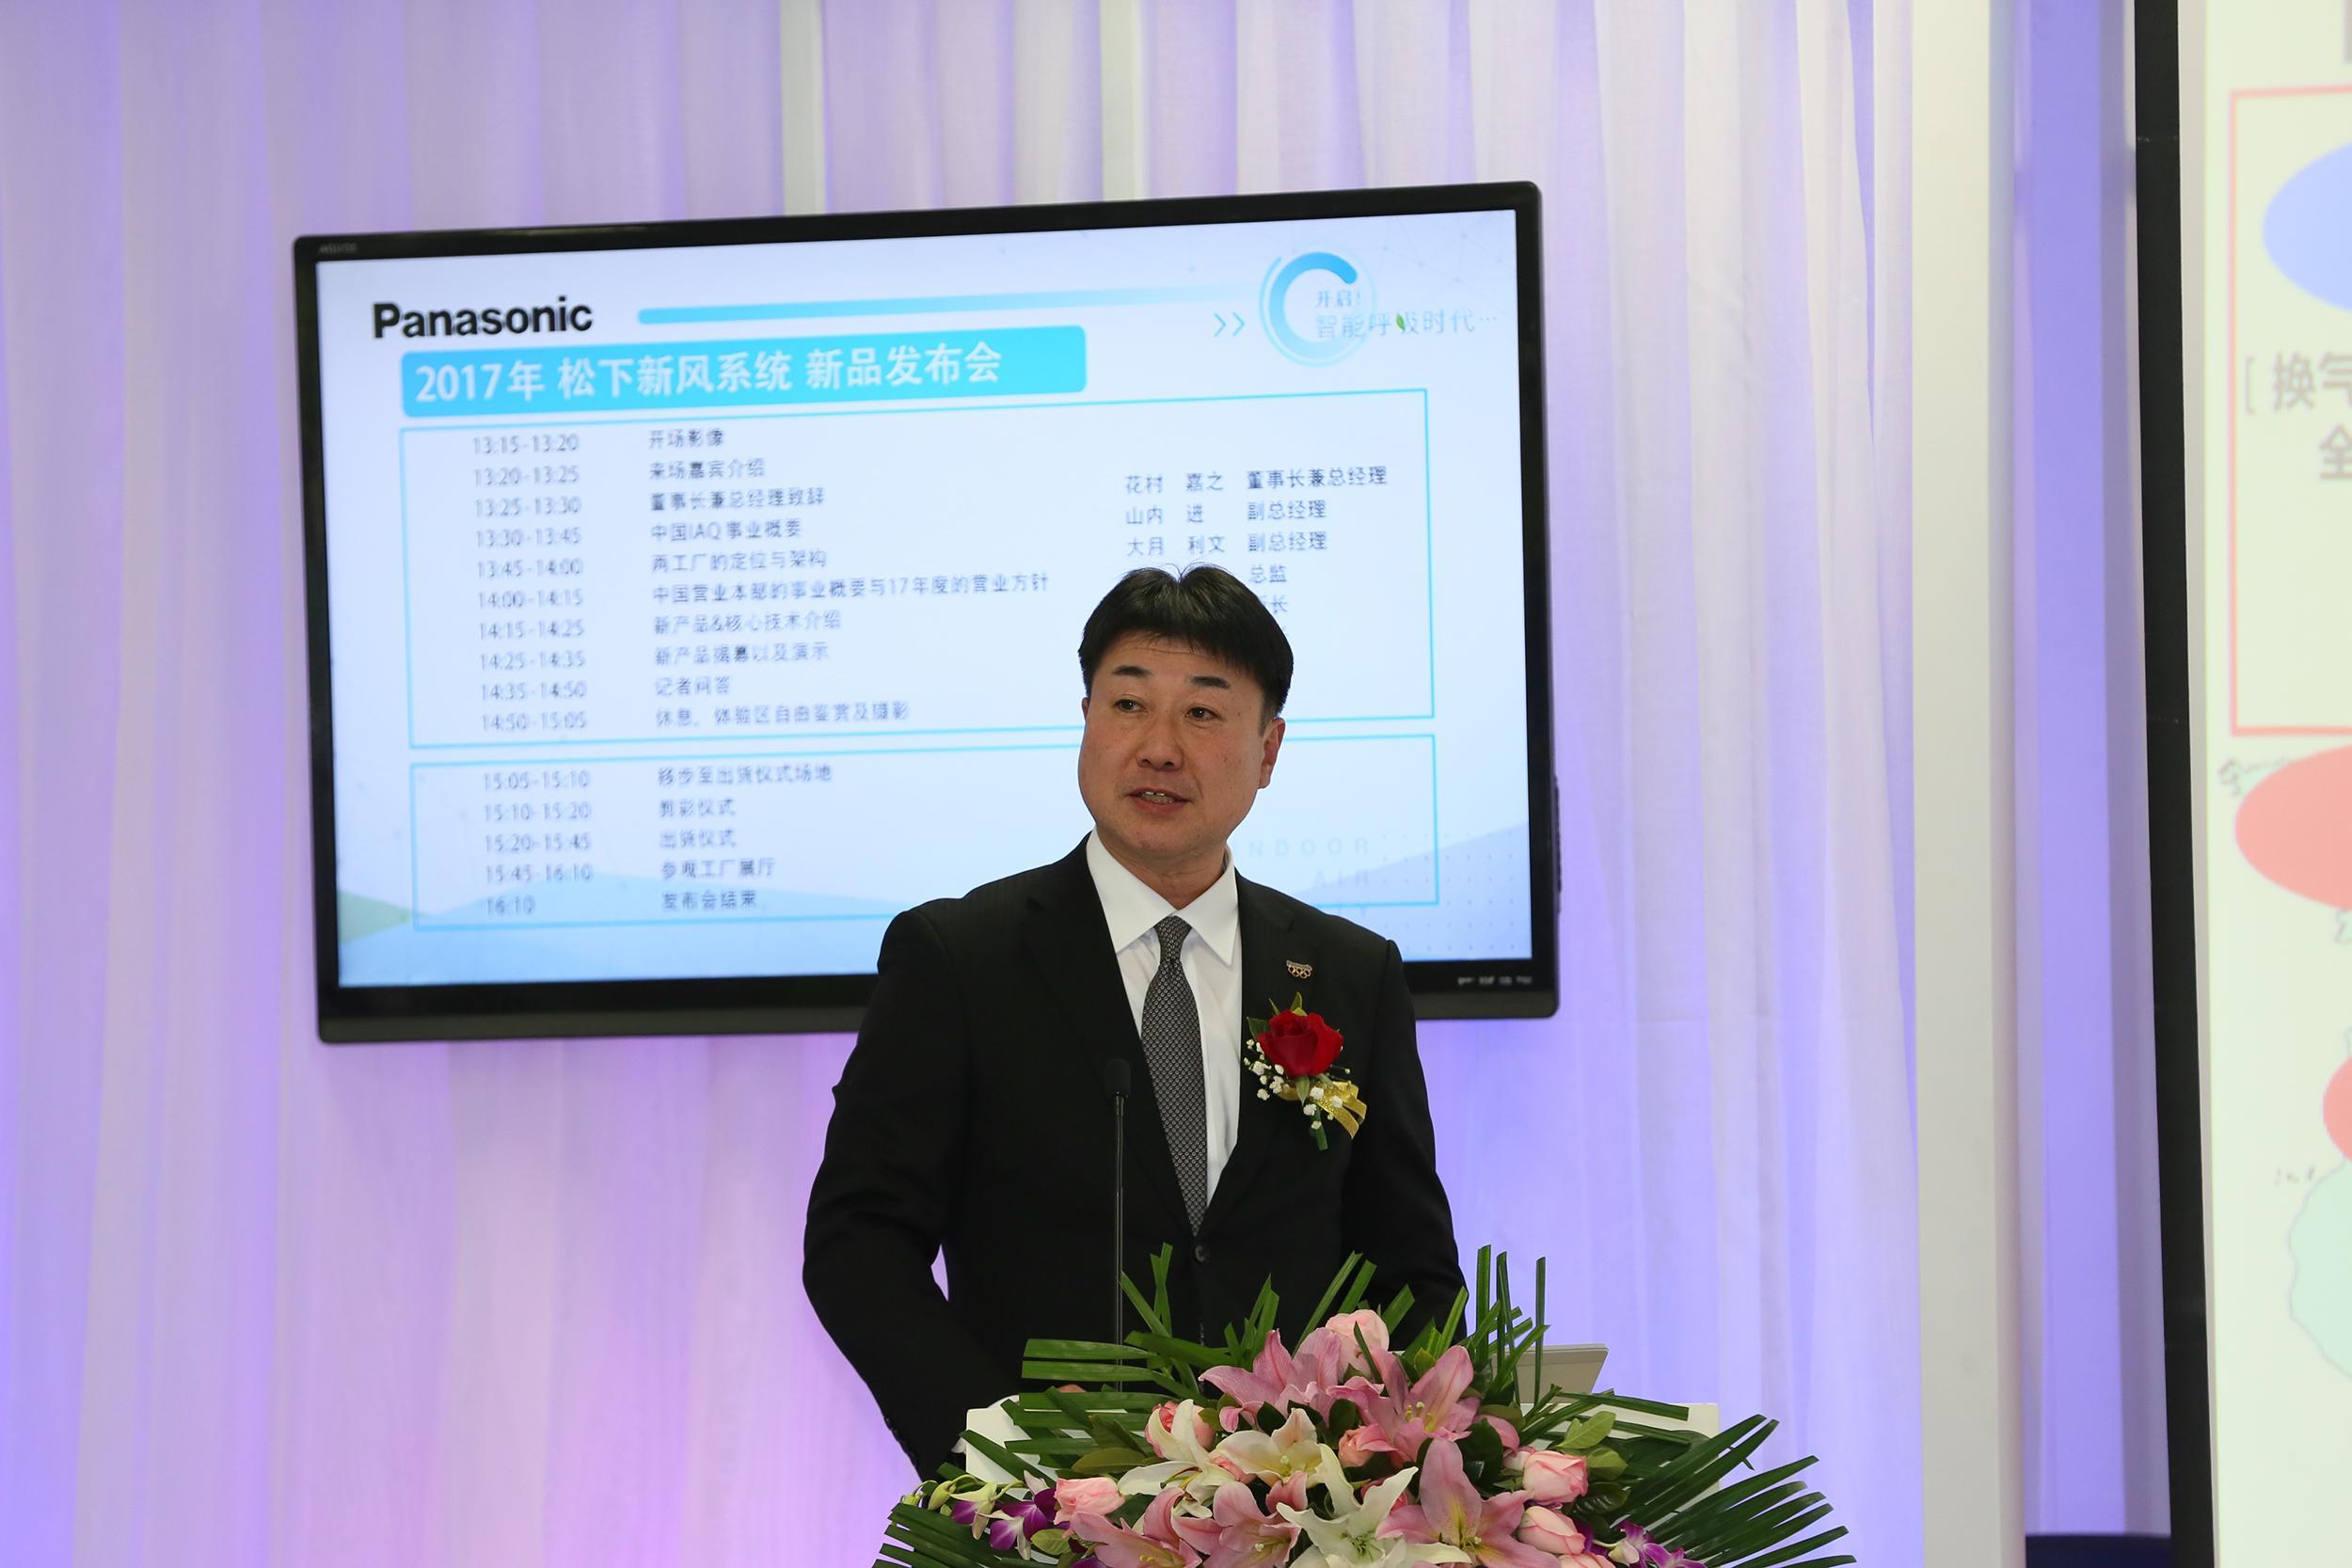 photo: Deputy Managing Director Susumu Yamauchi